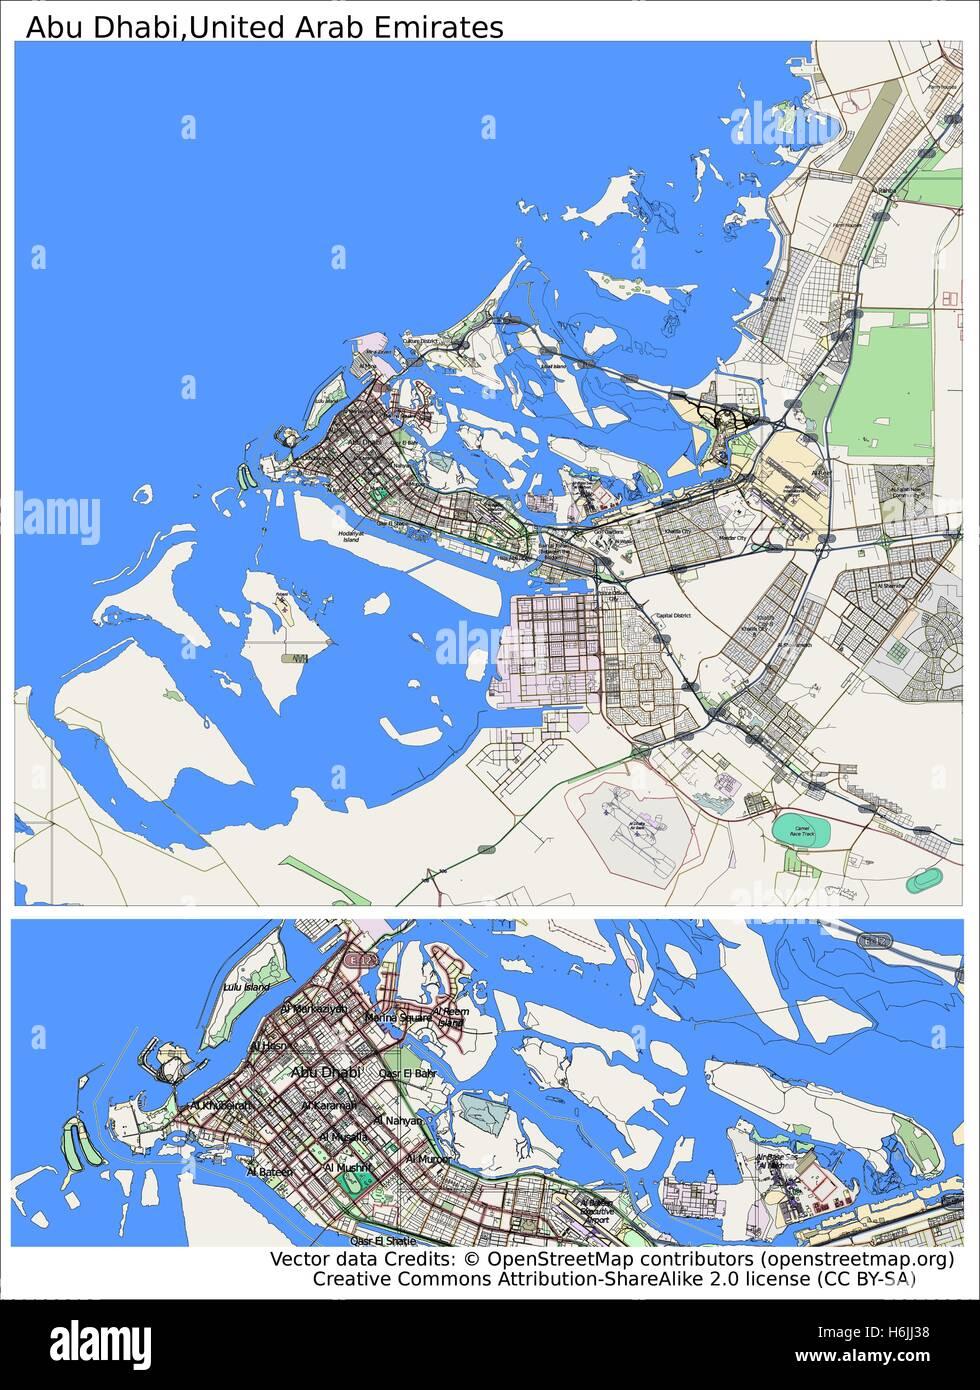 Abu Dhabi Emirates city map Stock Vector Art Illustration Vector